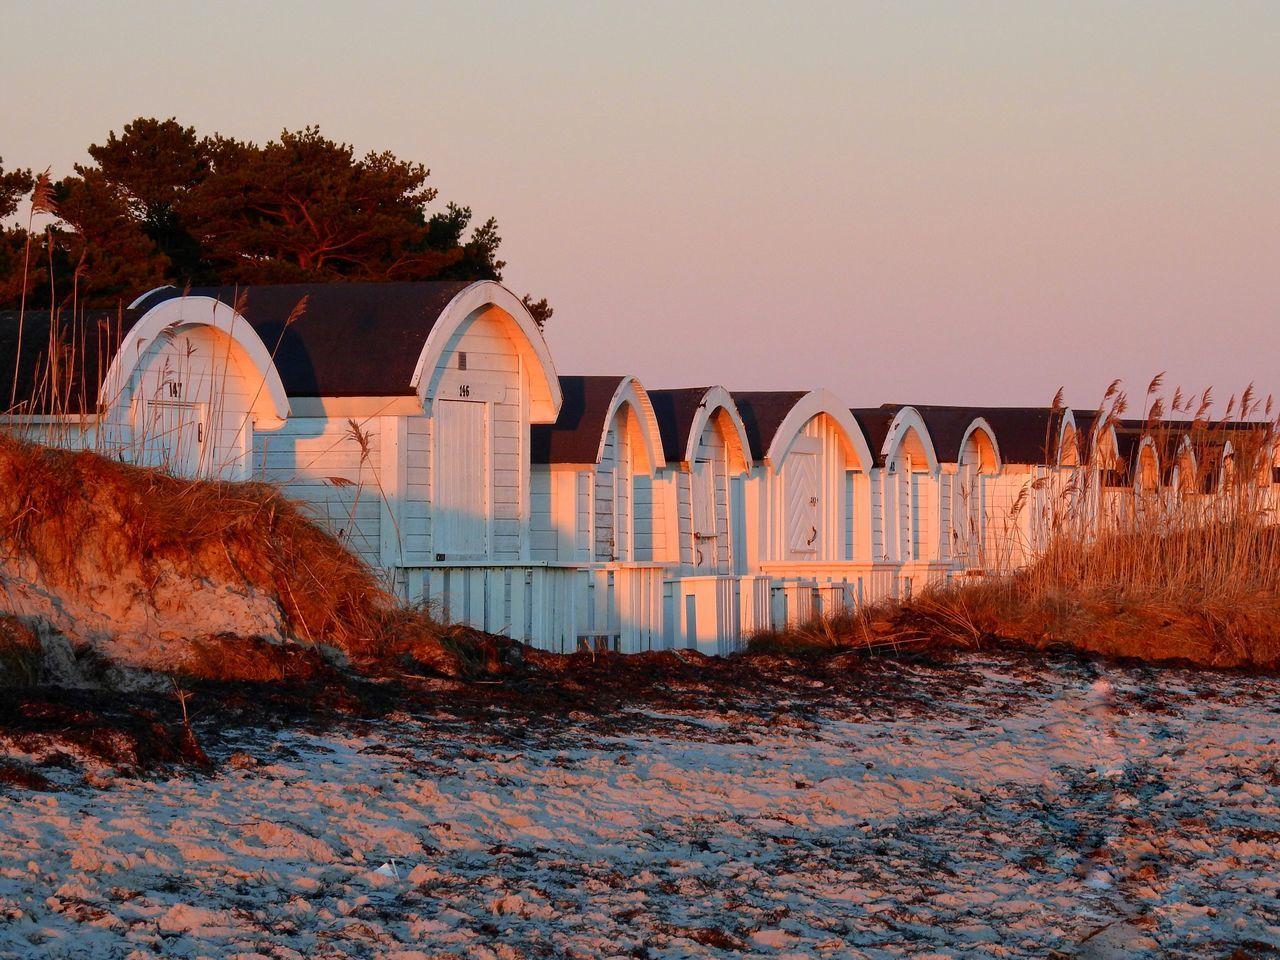 Architecture Beachphotography Outdoors Clear Sky Beachhuts Beach Sanddunes Reeds Light